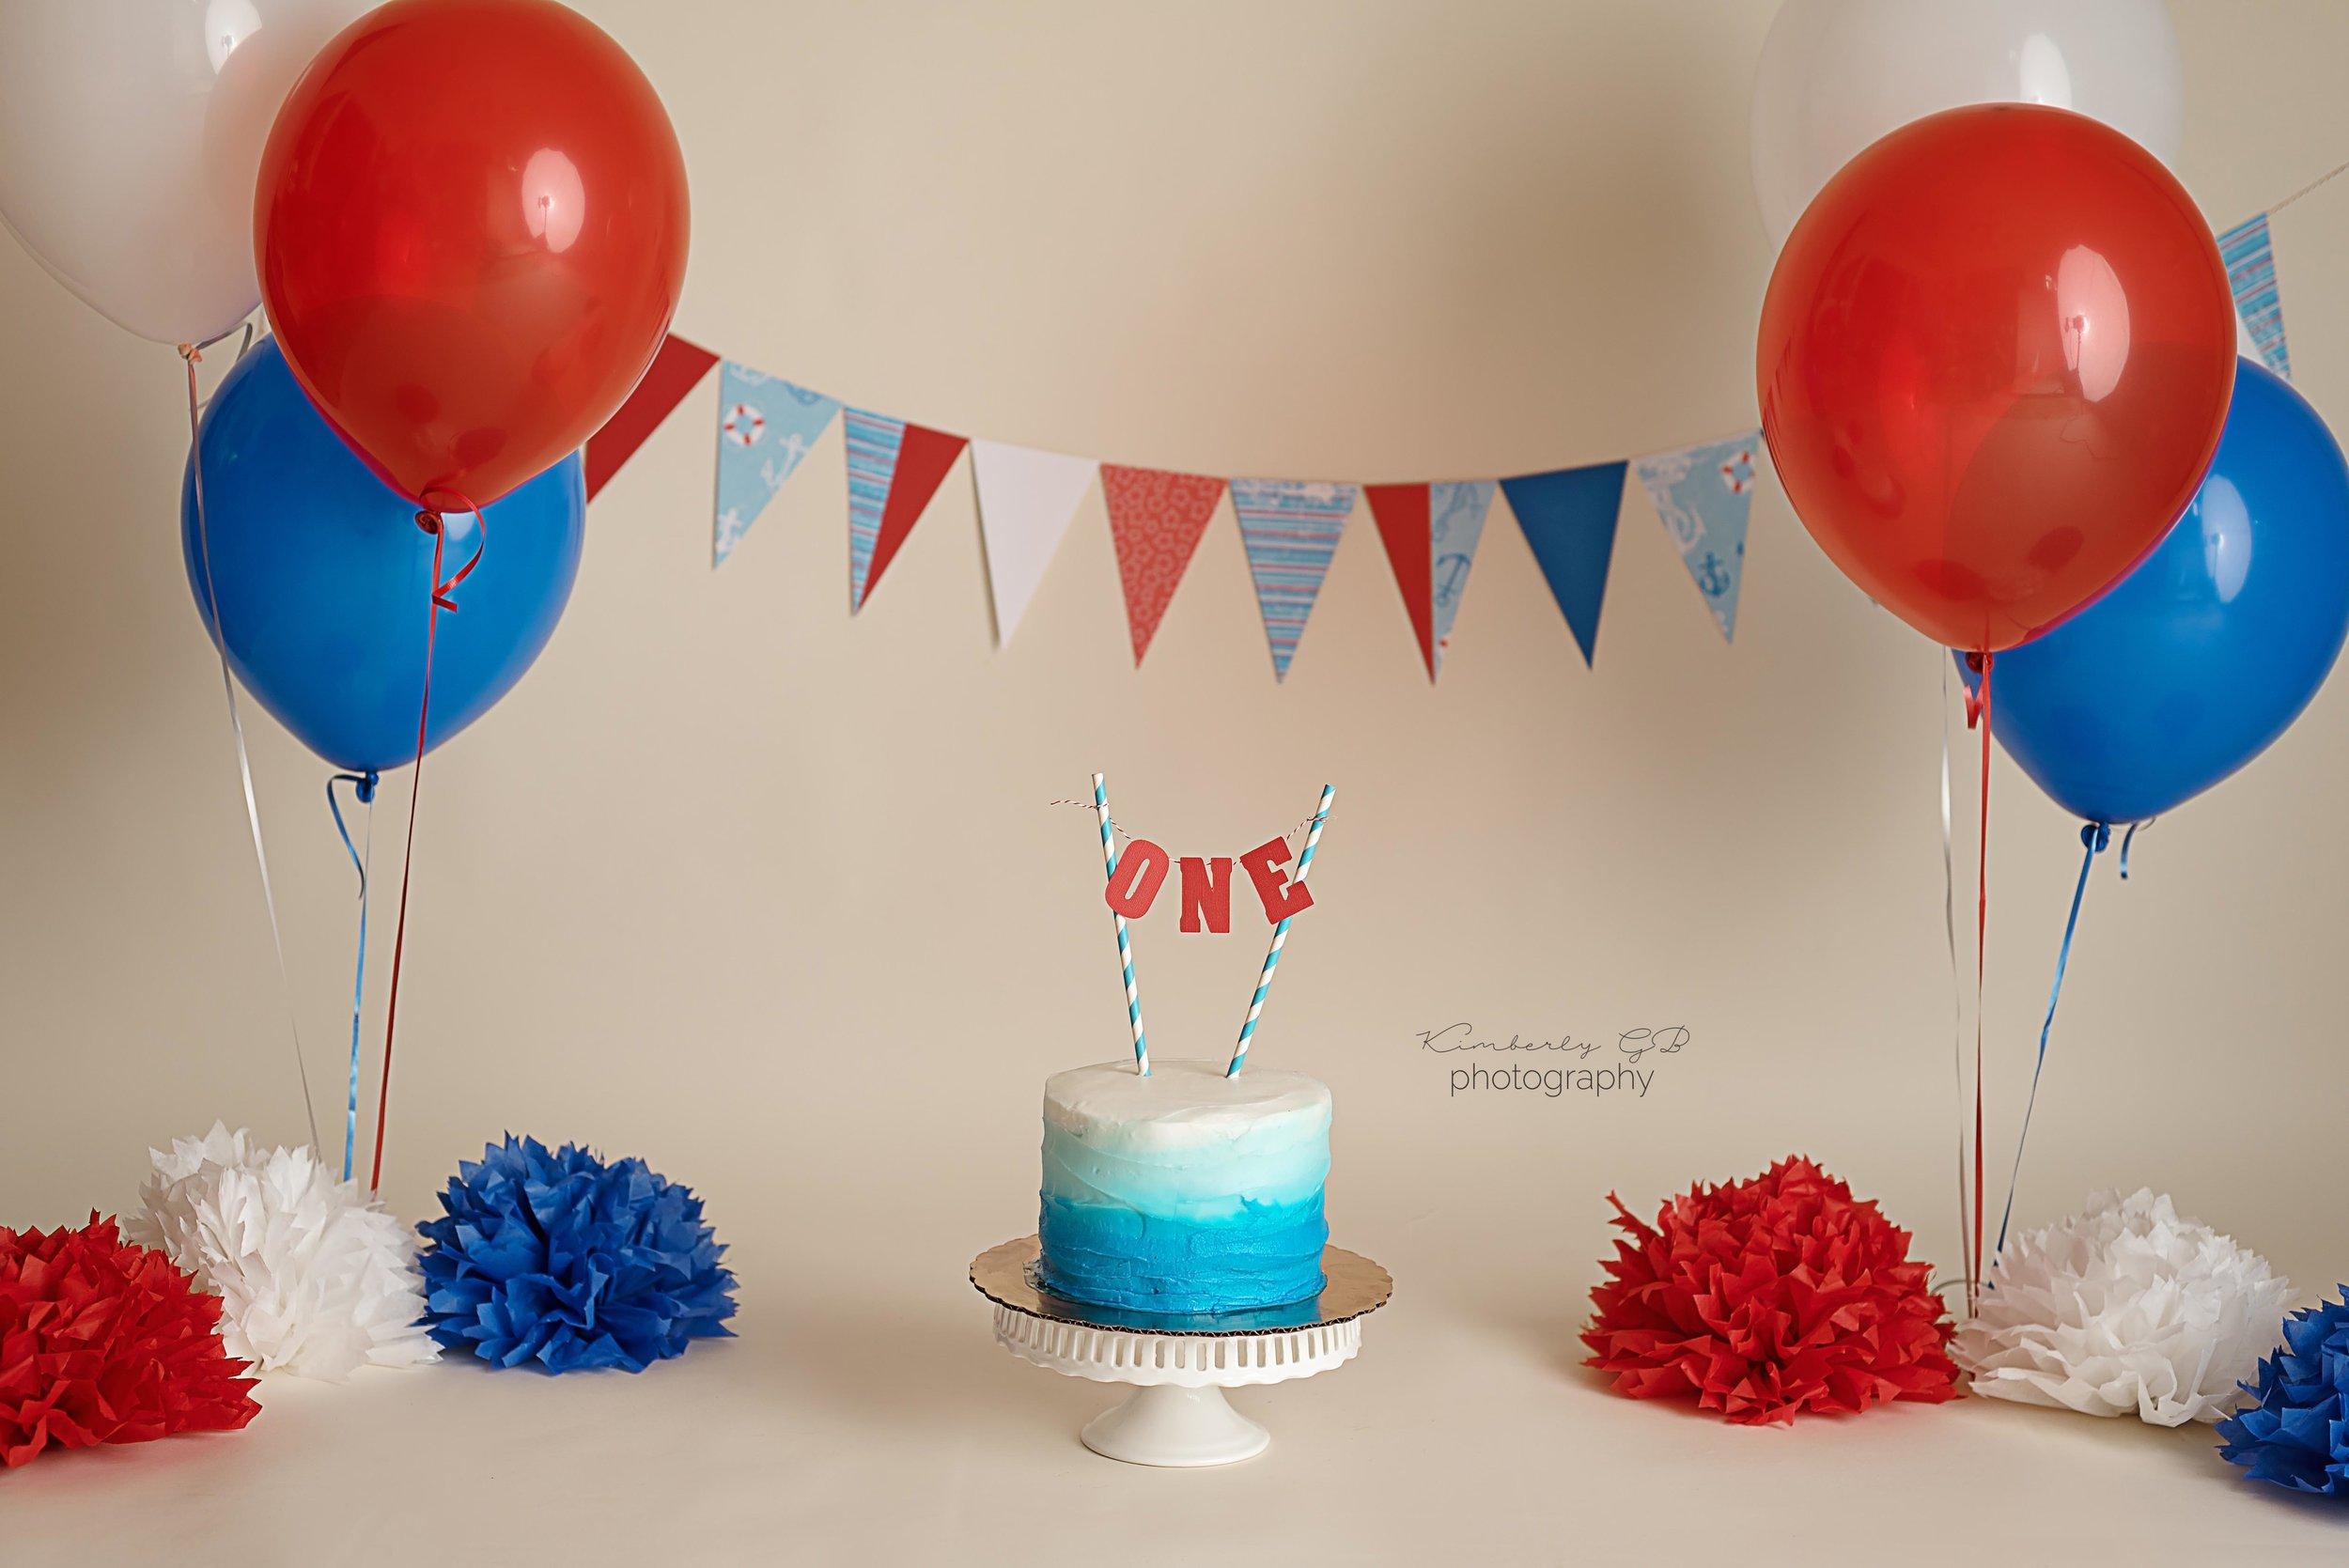 fotografia-de-ninos-primer-ano-anito-cake-smash-bizcocho-en-puerto-rico-kimberly-gb-photography-fotografa-11.jpg